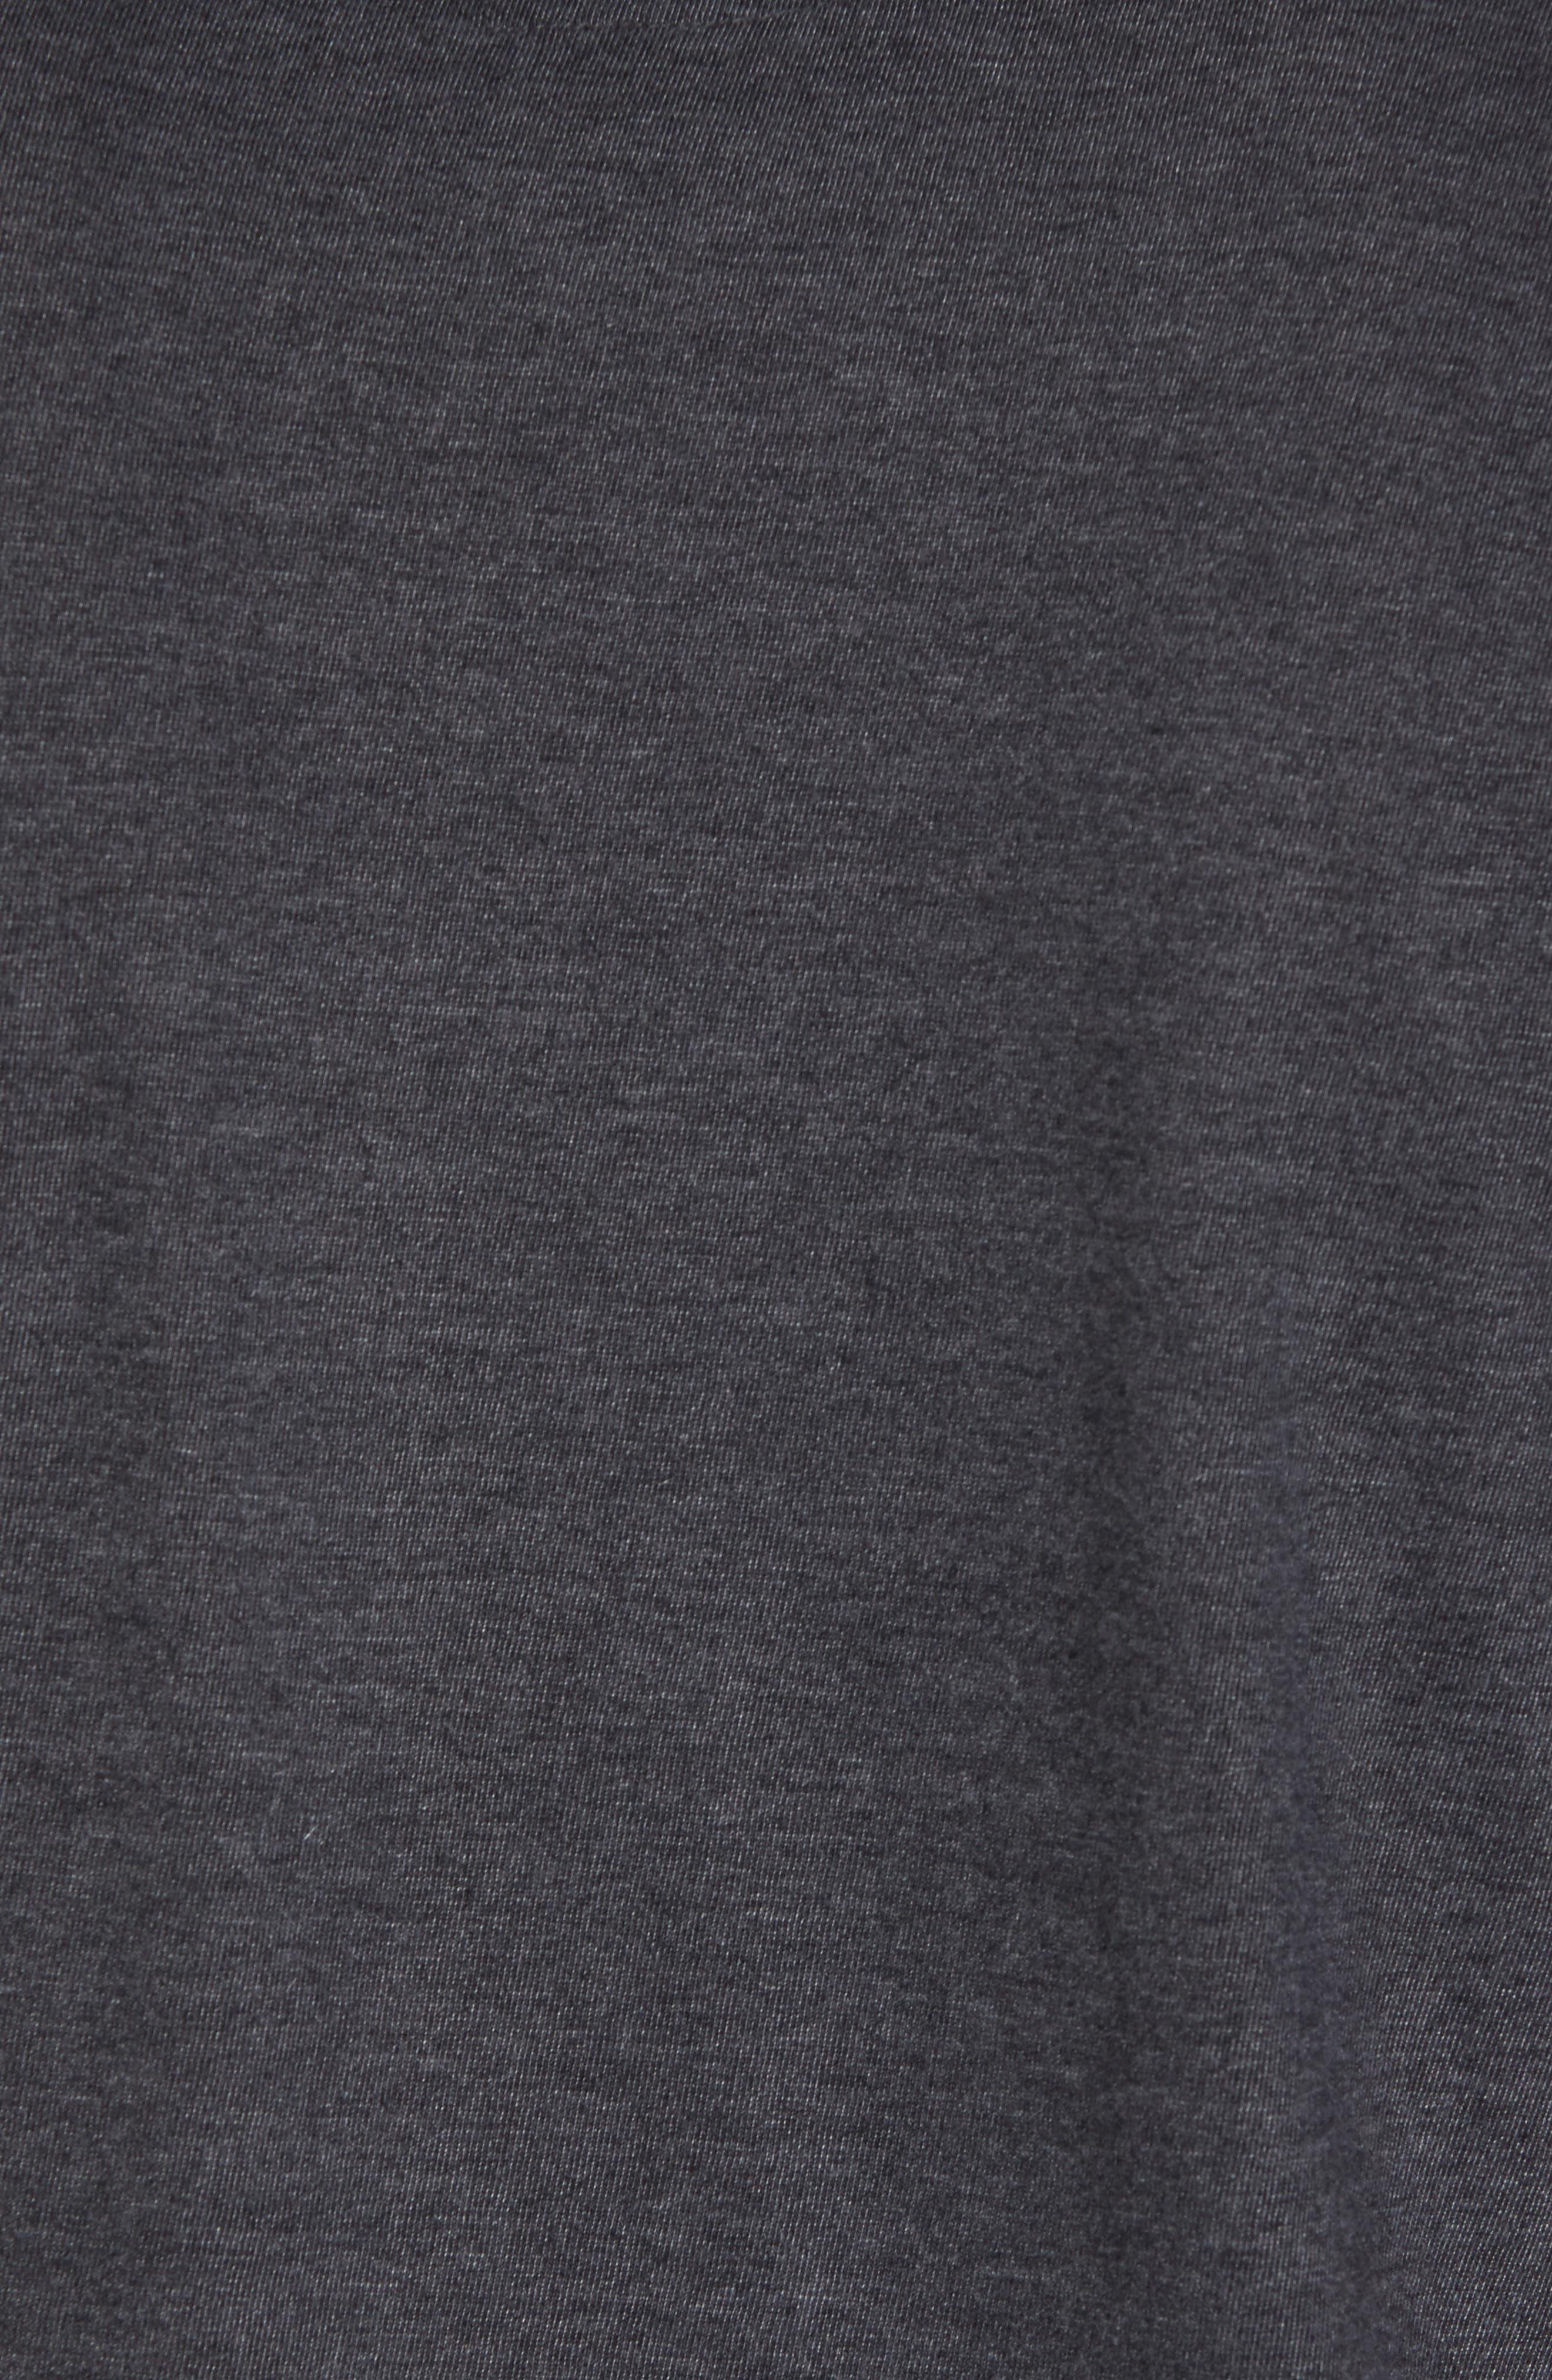 Hillwood Bruins T-Shirt,                             Alternate thumbnail 5, color,                             Heather Black